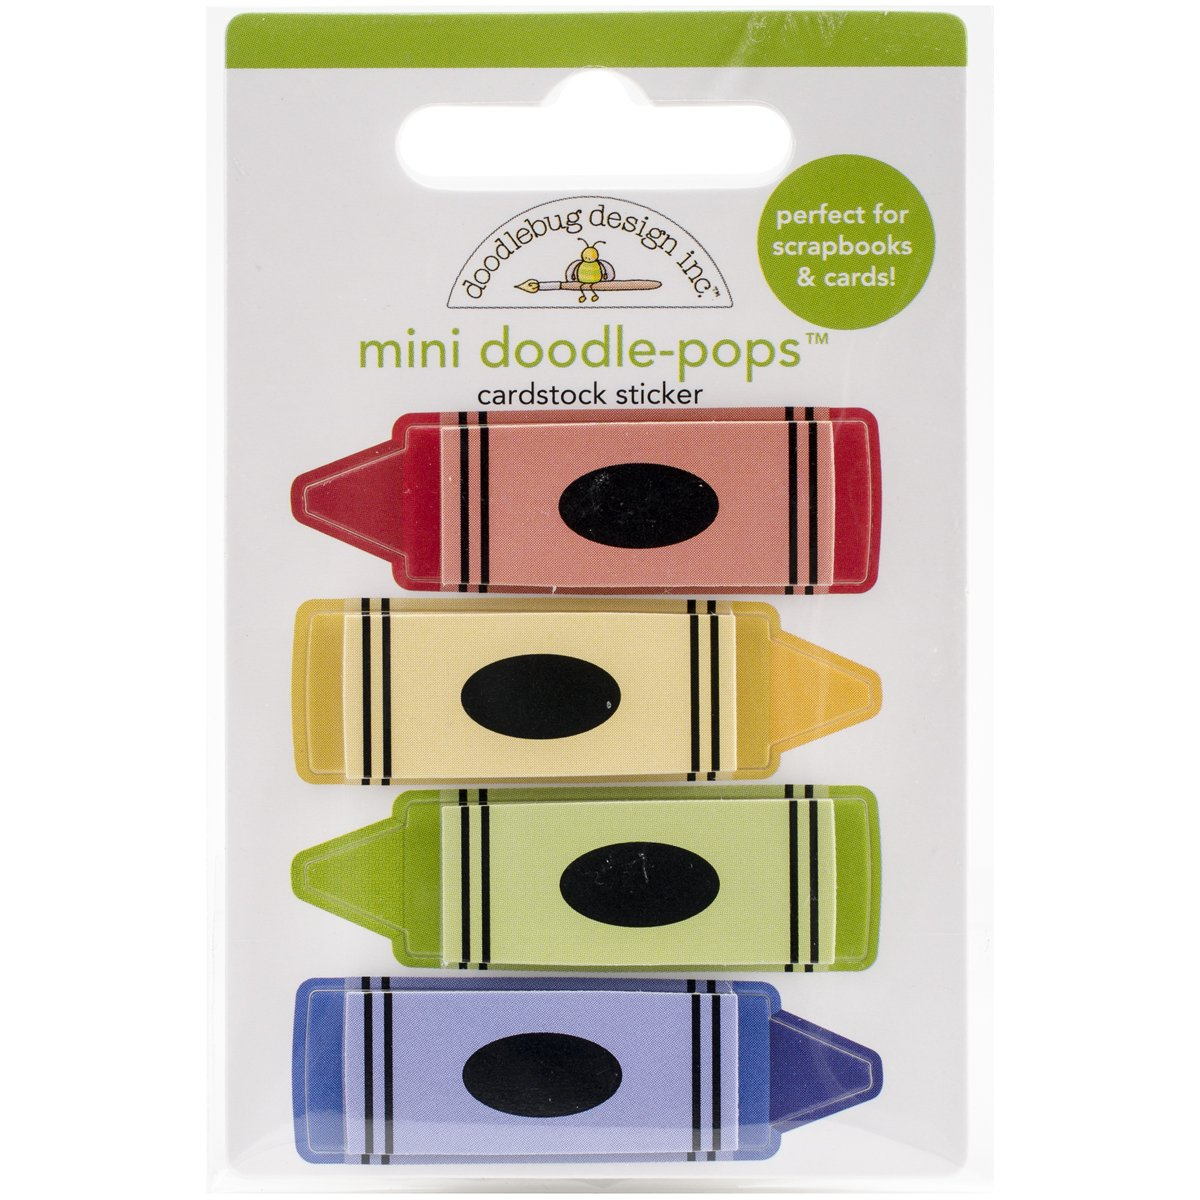 Doodlebug School Doodle-Pops Crayons Impreziosito Adesivi 3D